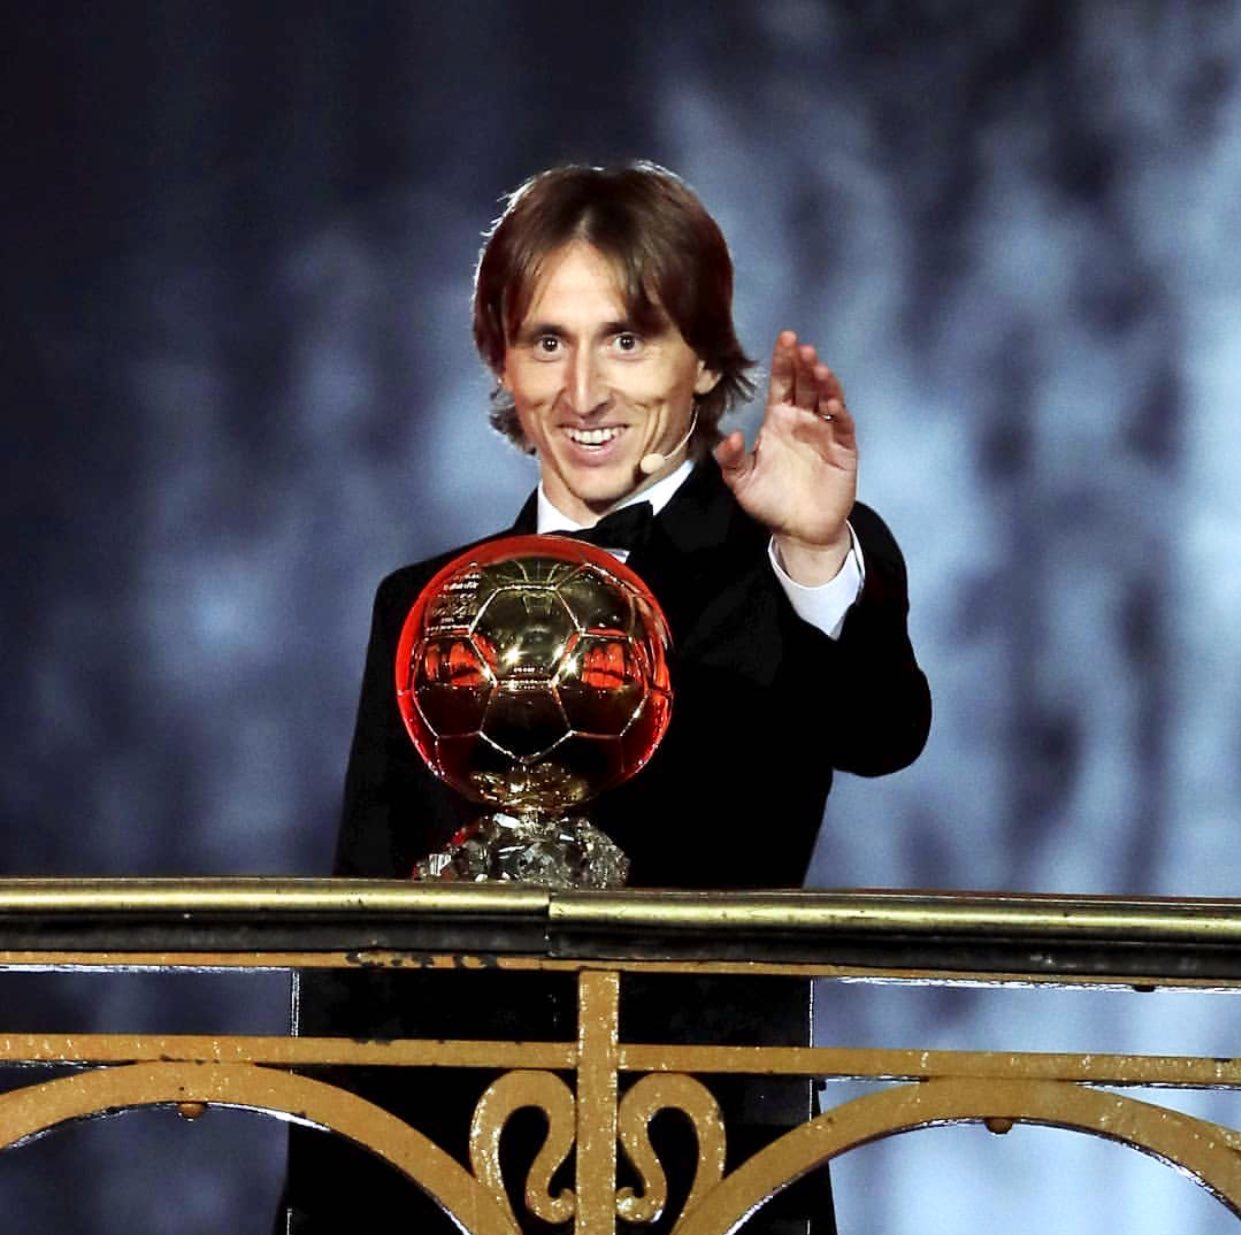 Modric Savours 'Unique Feeling' Of Ballon d'Or Win